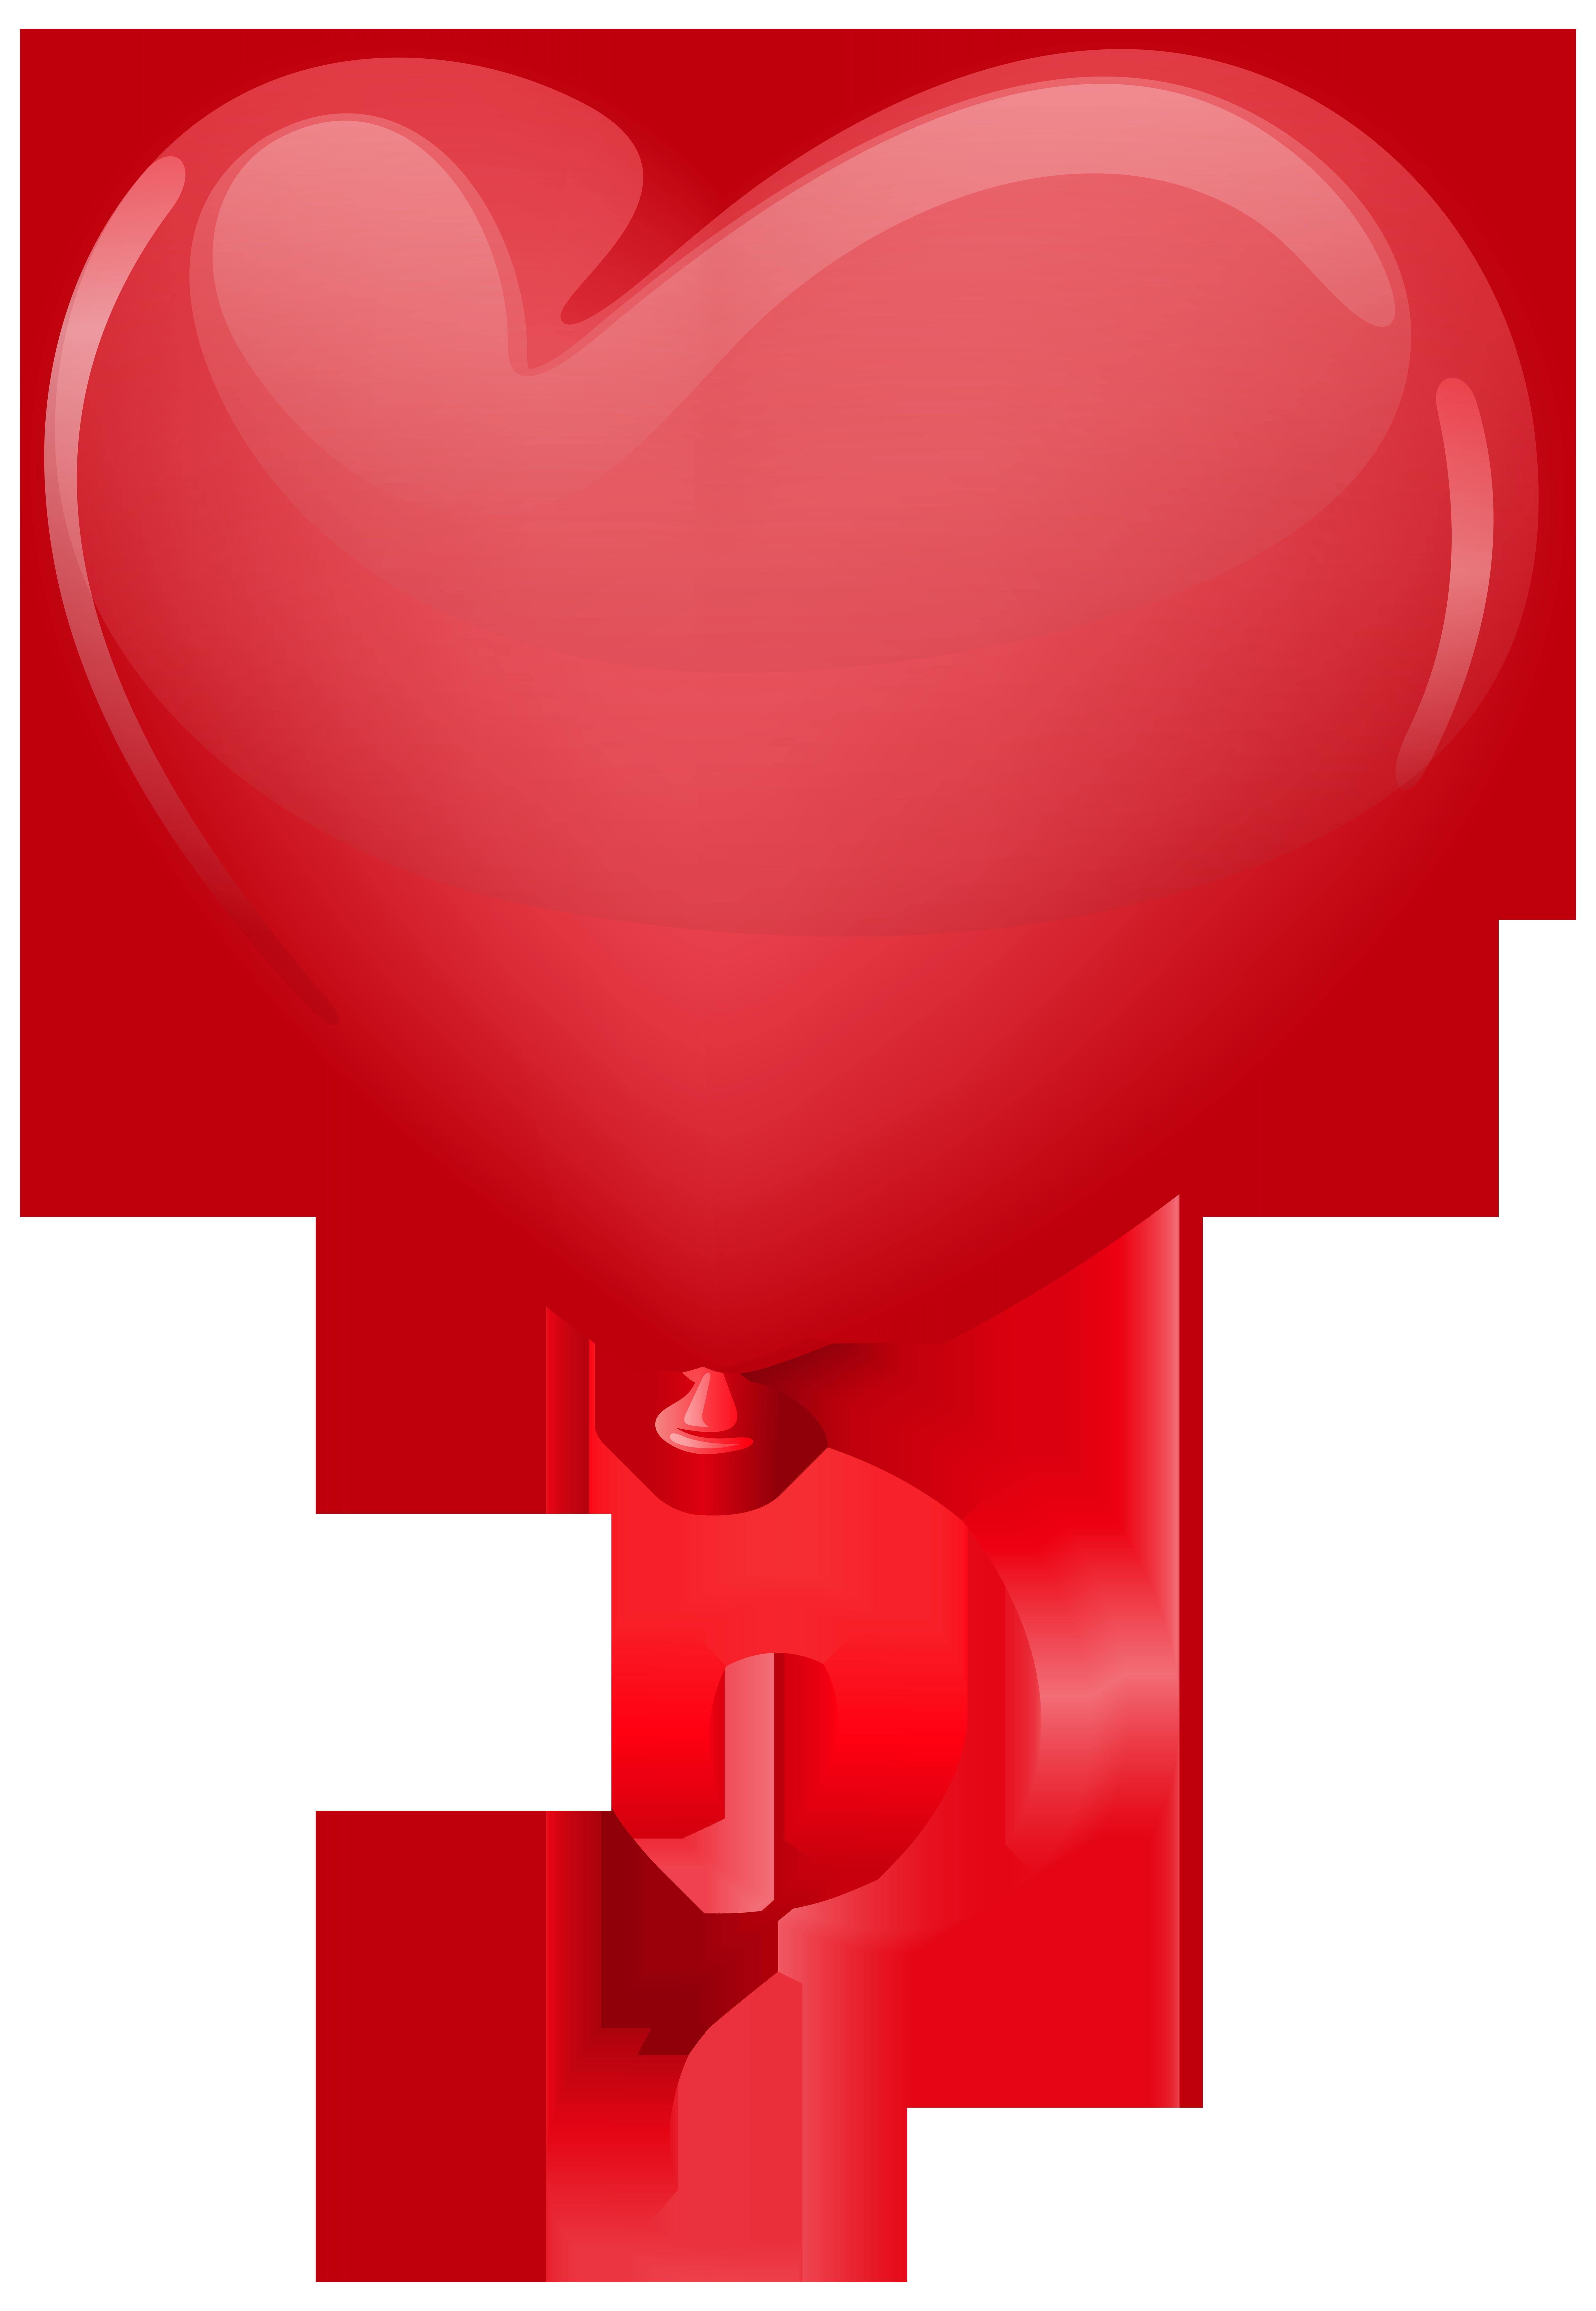 5526x8000 Red Heart Balloon Clip Art Png Imageu200b Gallery Yopriceville